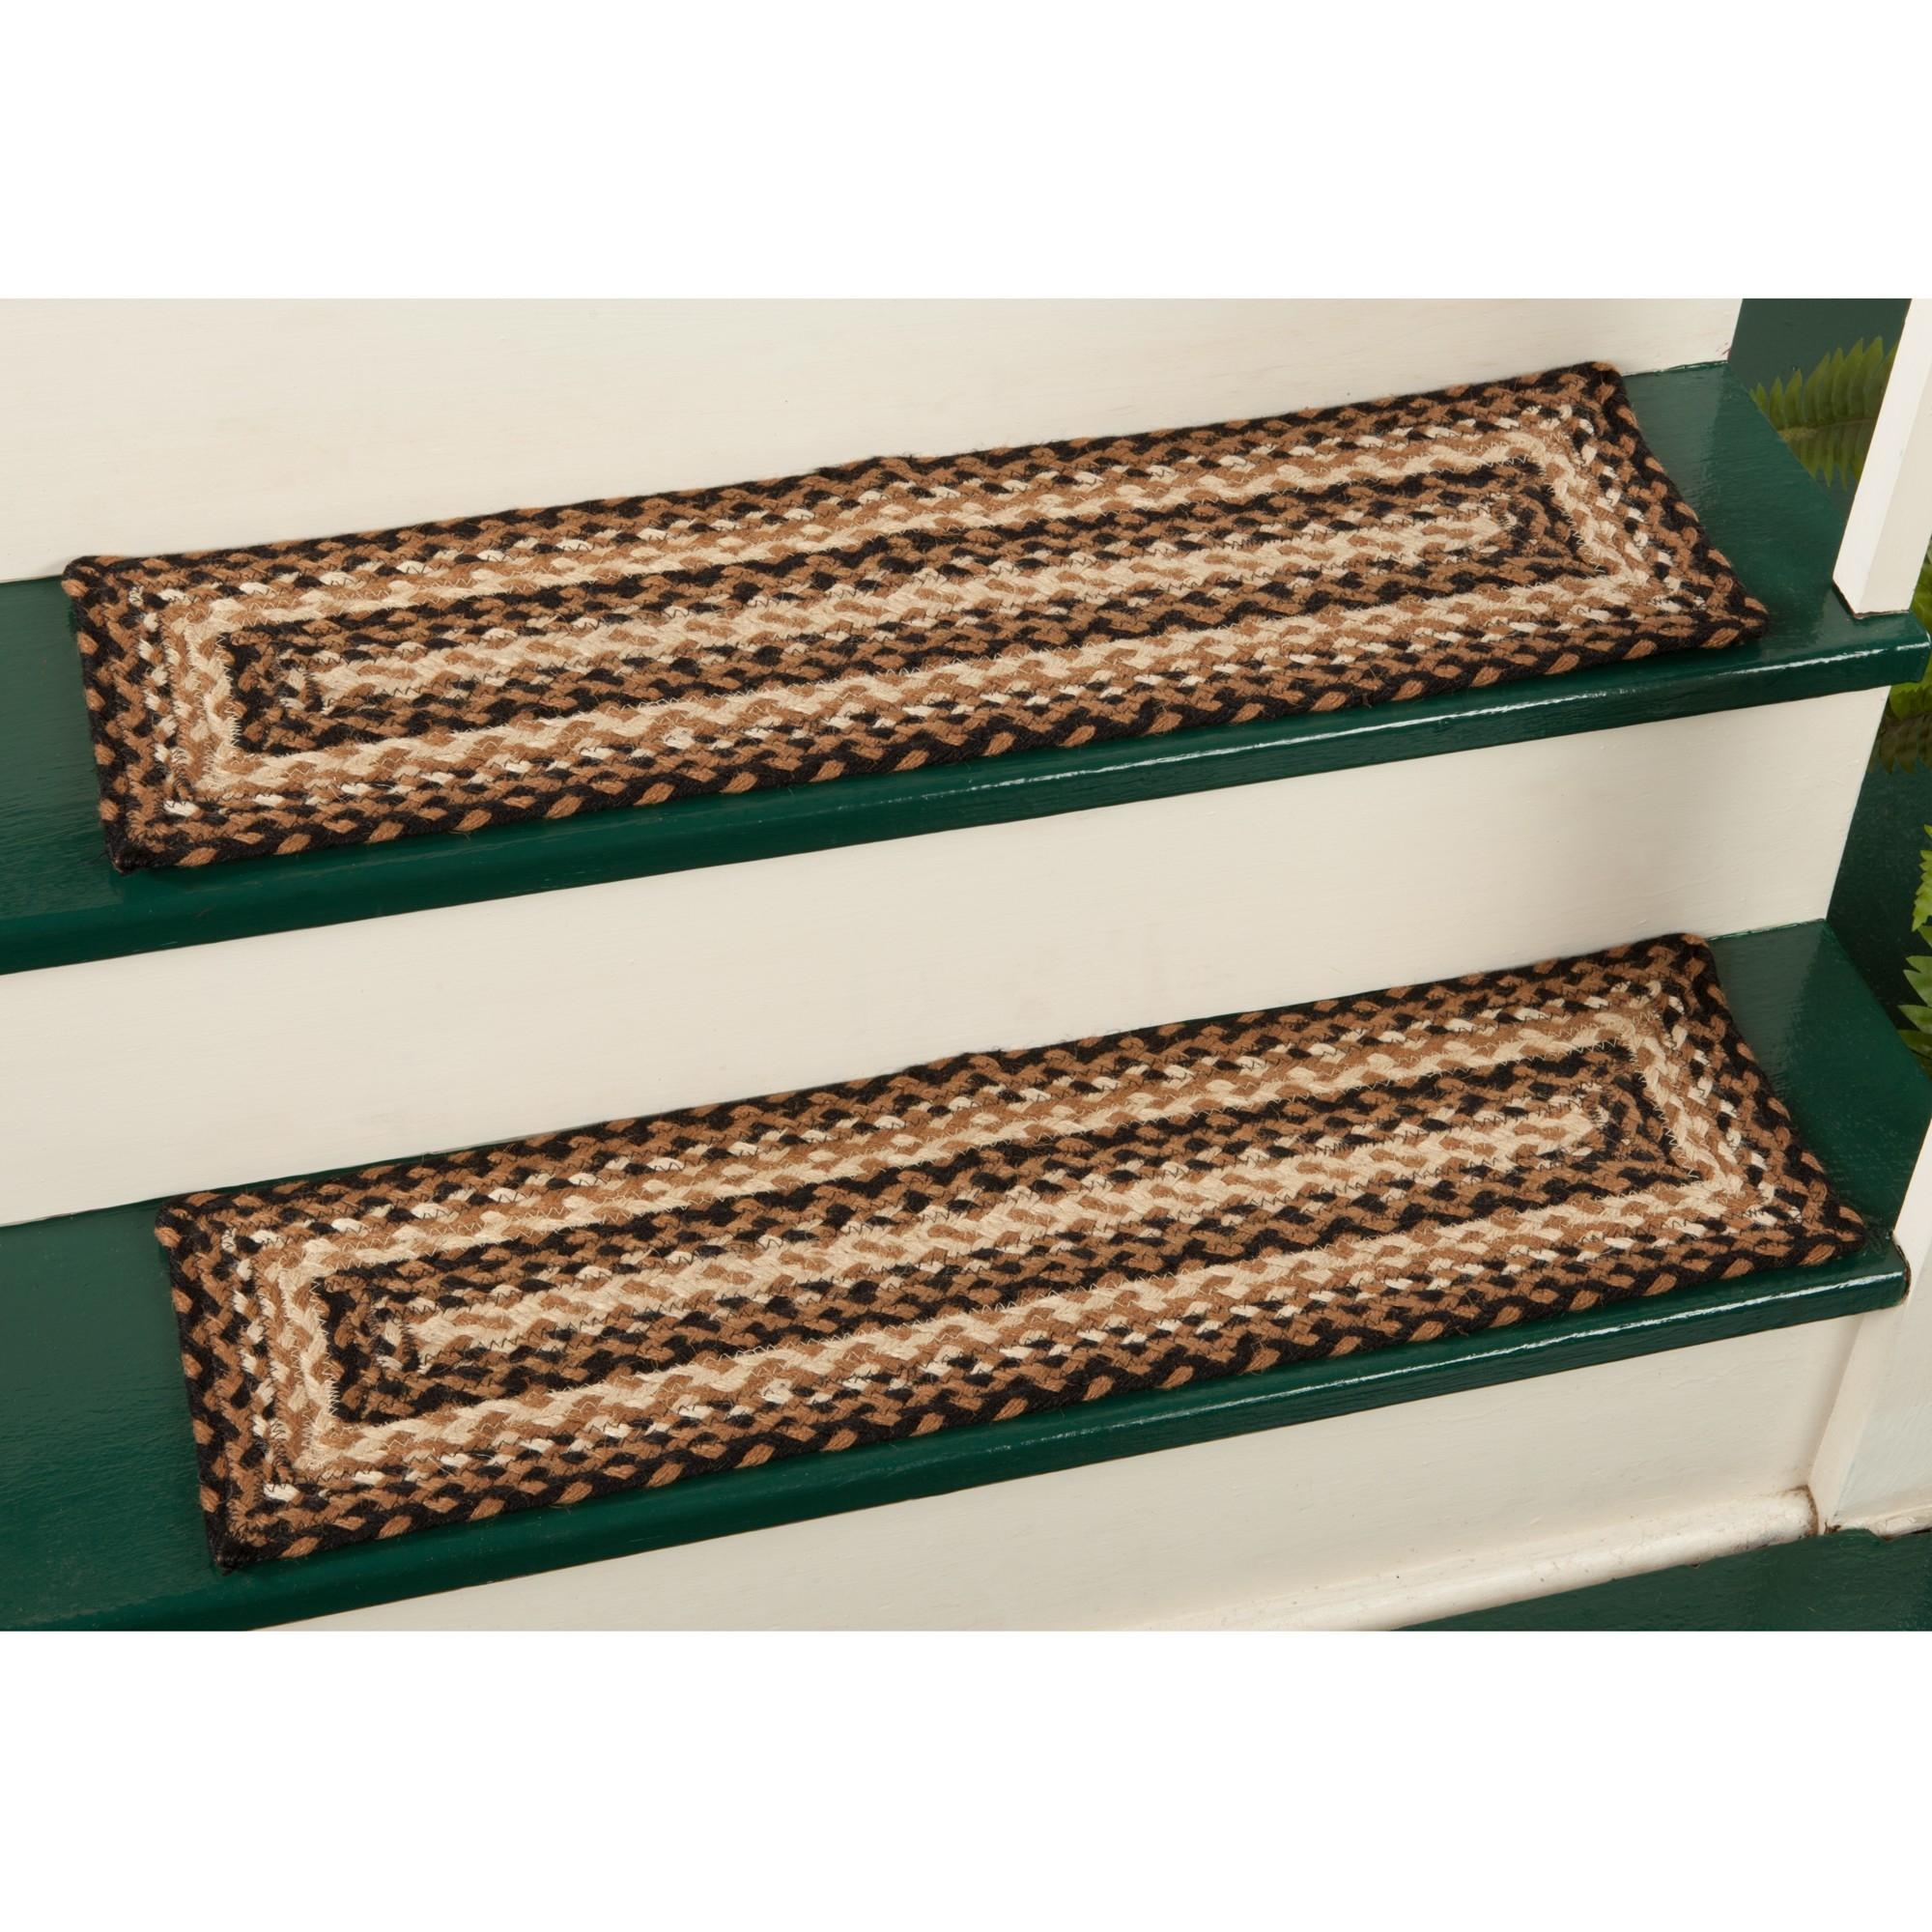 Braided Stair Tread Rugs Roselawnlutheran In Rectangular Stair Tread Rugs (Image 2 of 15)